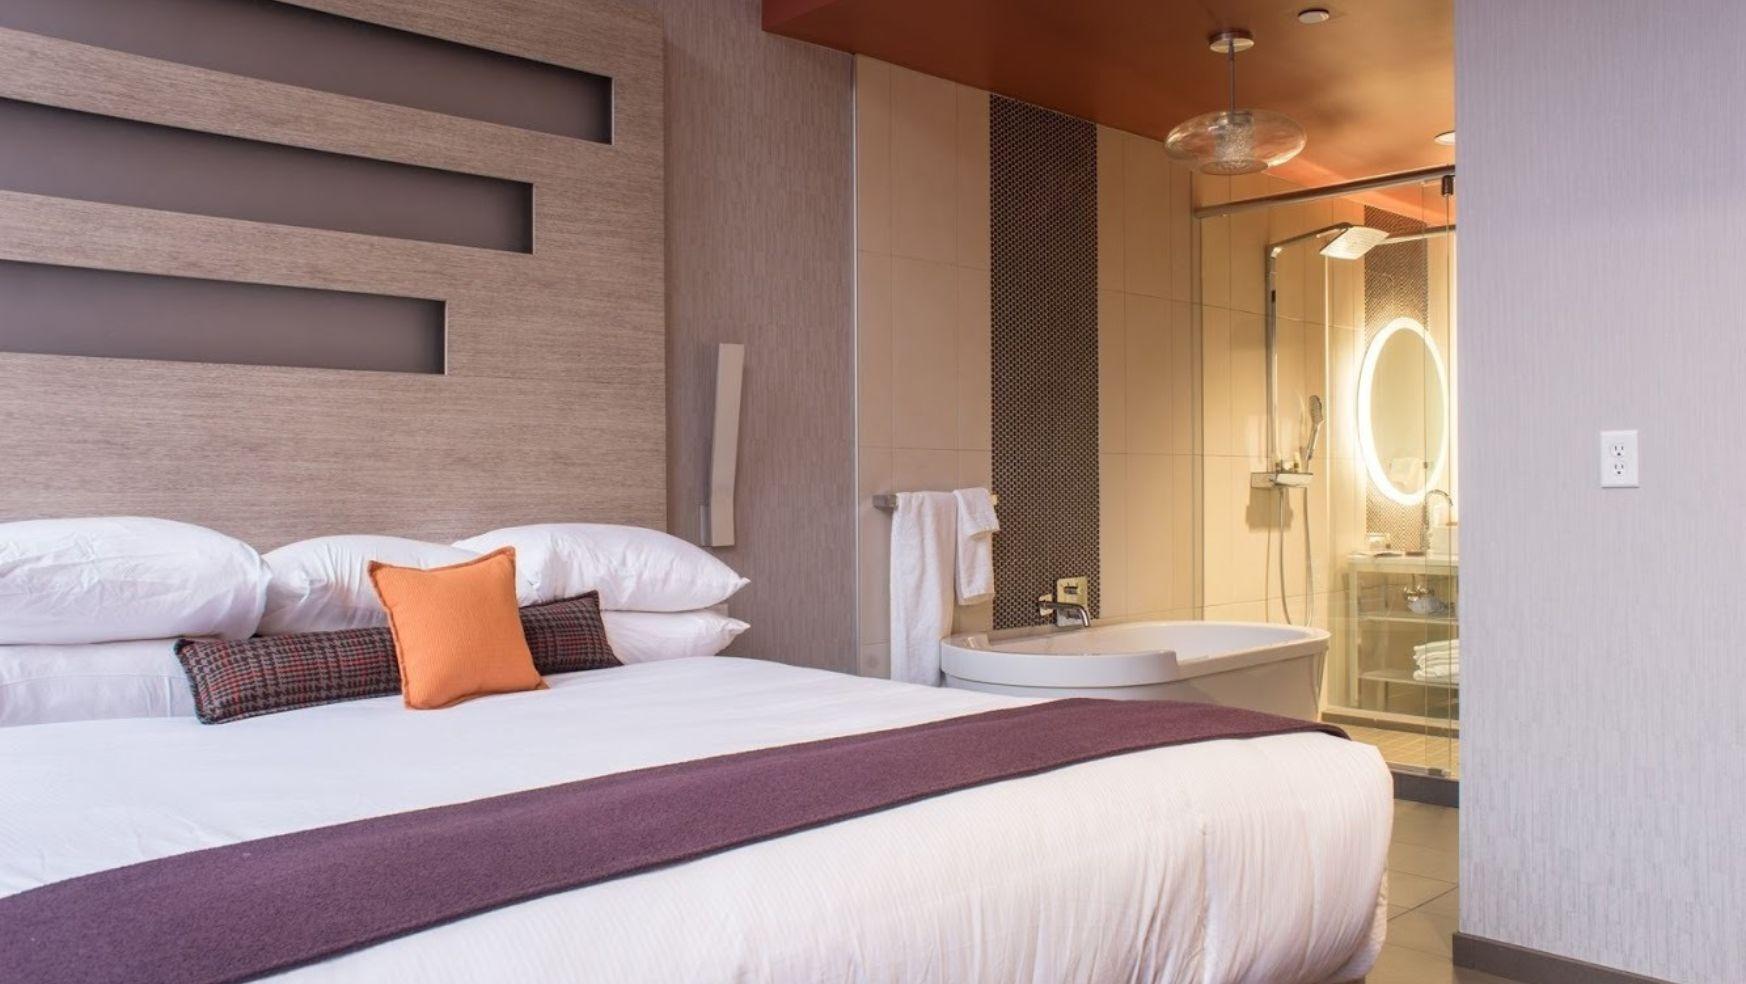 Cityflatshotel room photo